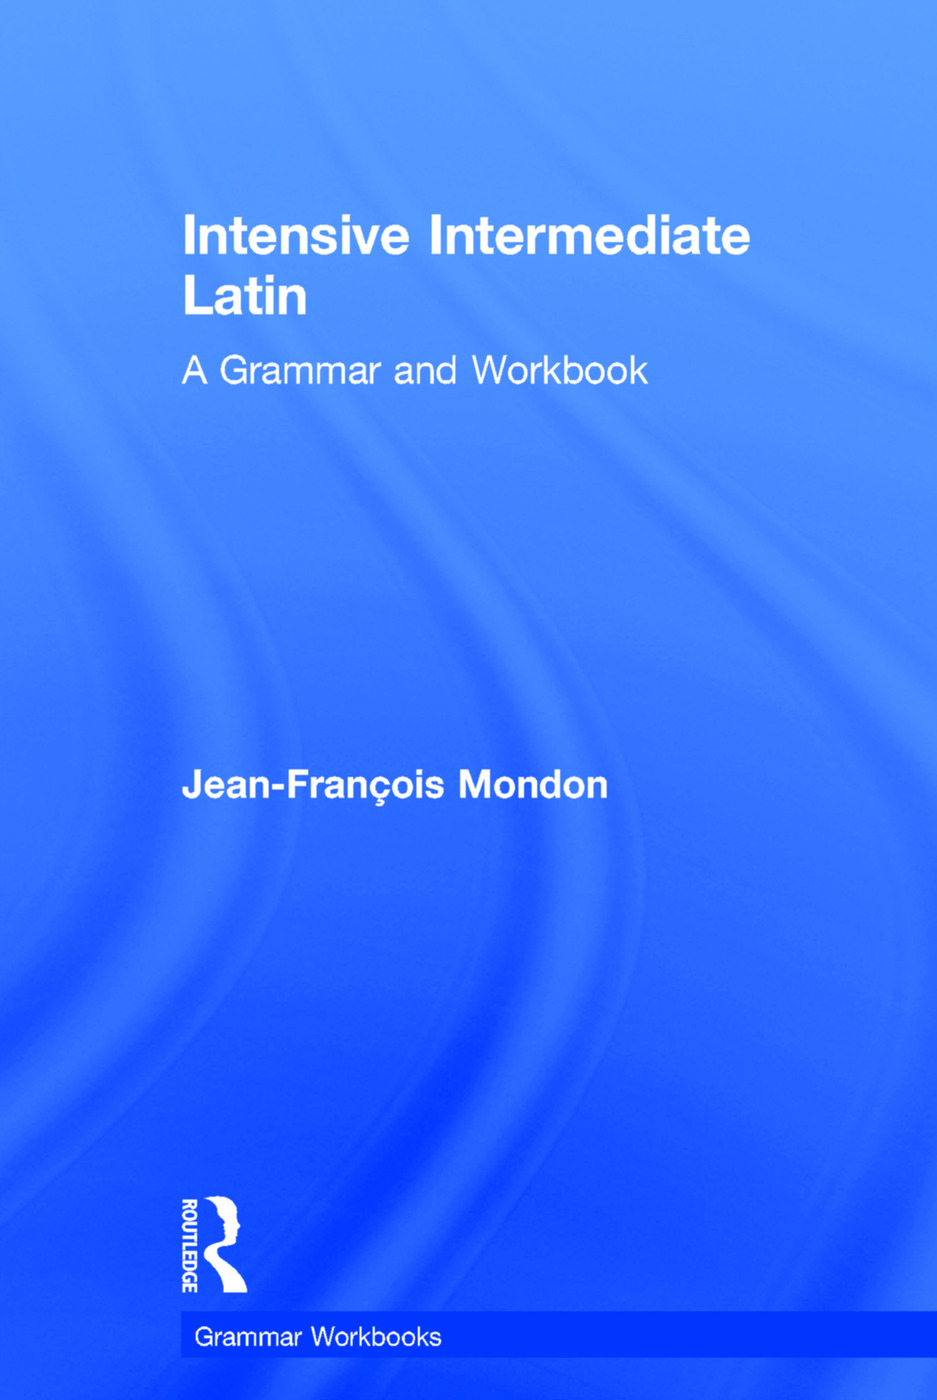 Intensive Intermediate Latin   A Grammar and Workbook